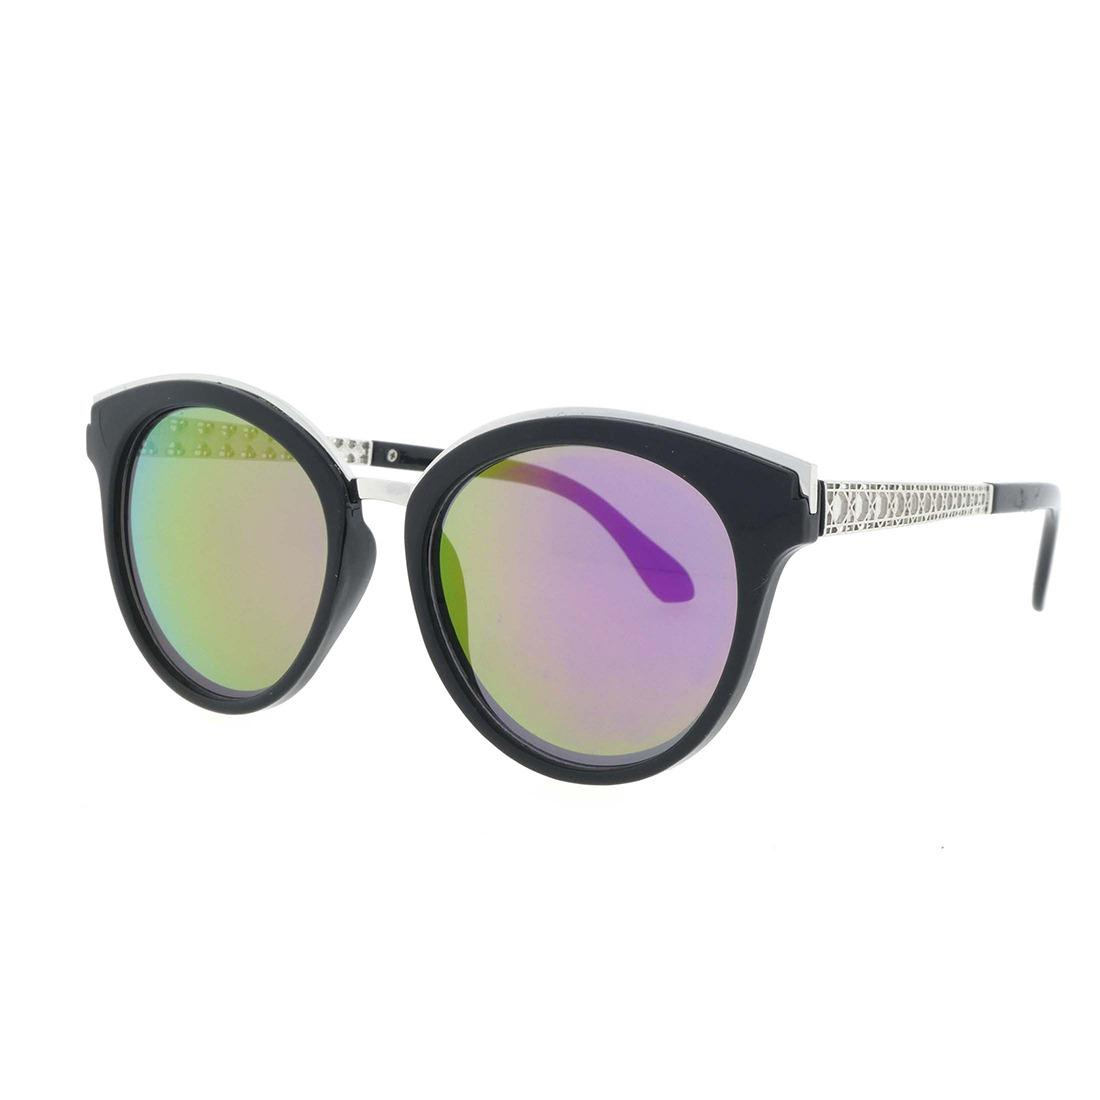 fotostudio bril productfotografie